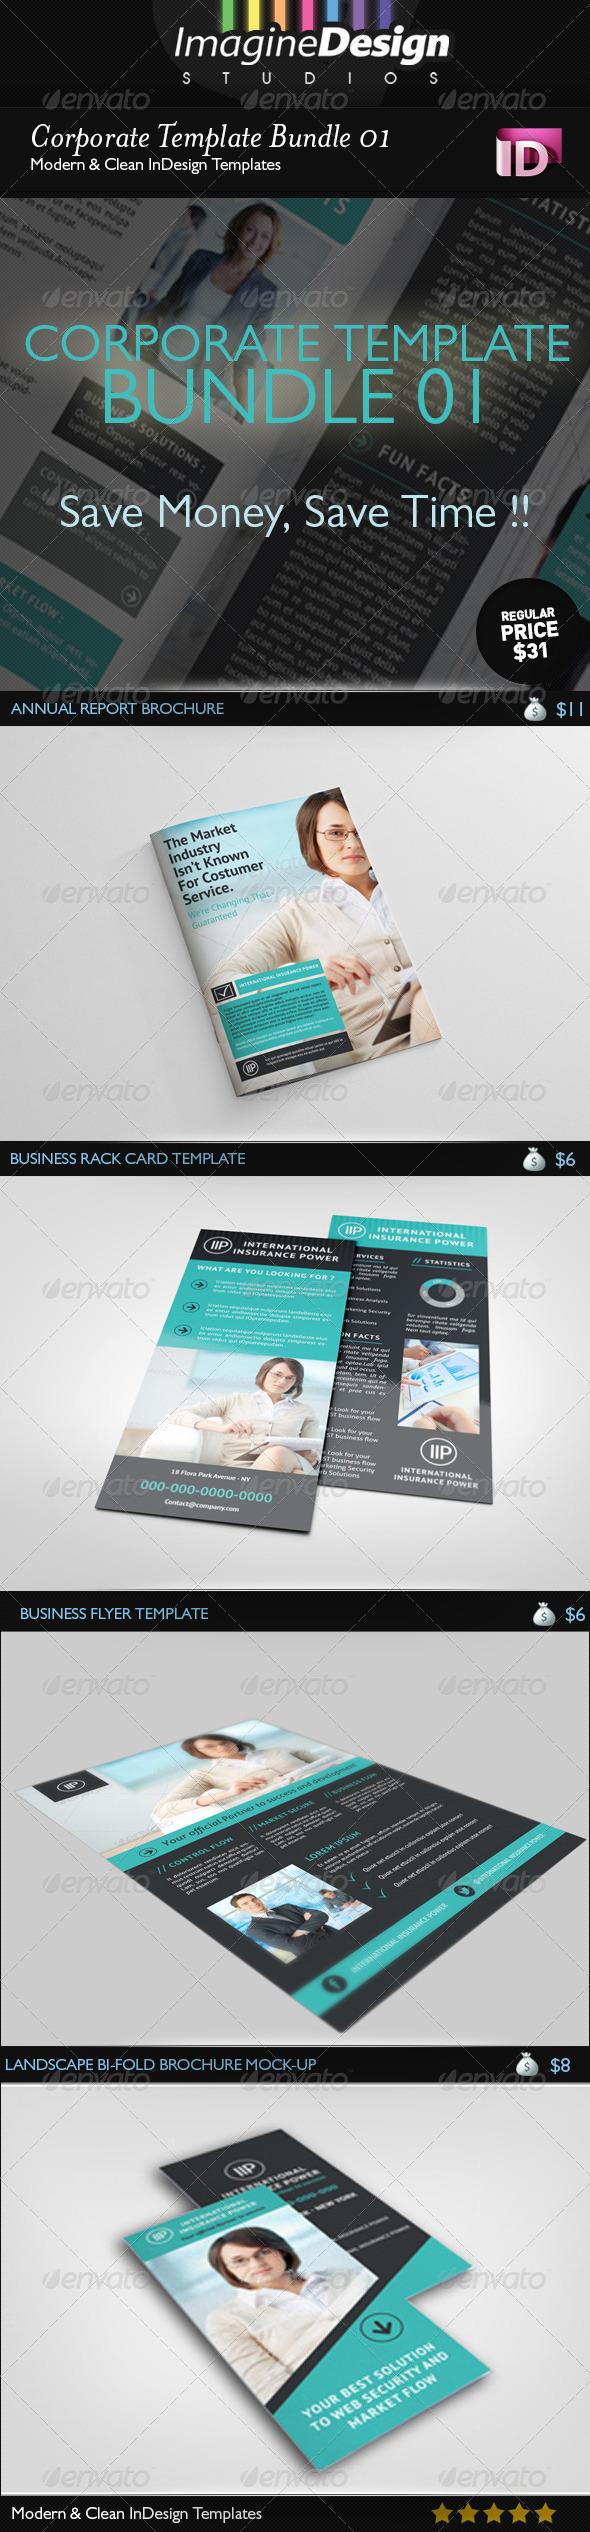 GraphicRiver Corporate Template Bundle 01 5909695